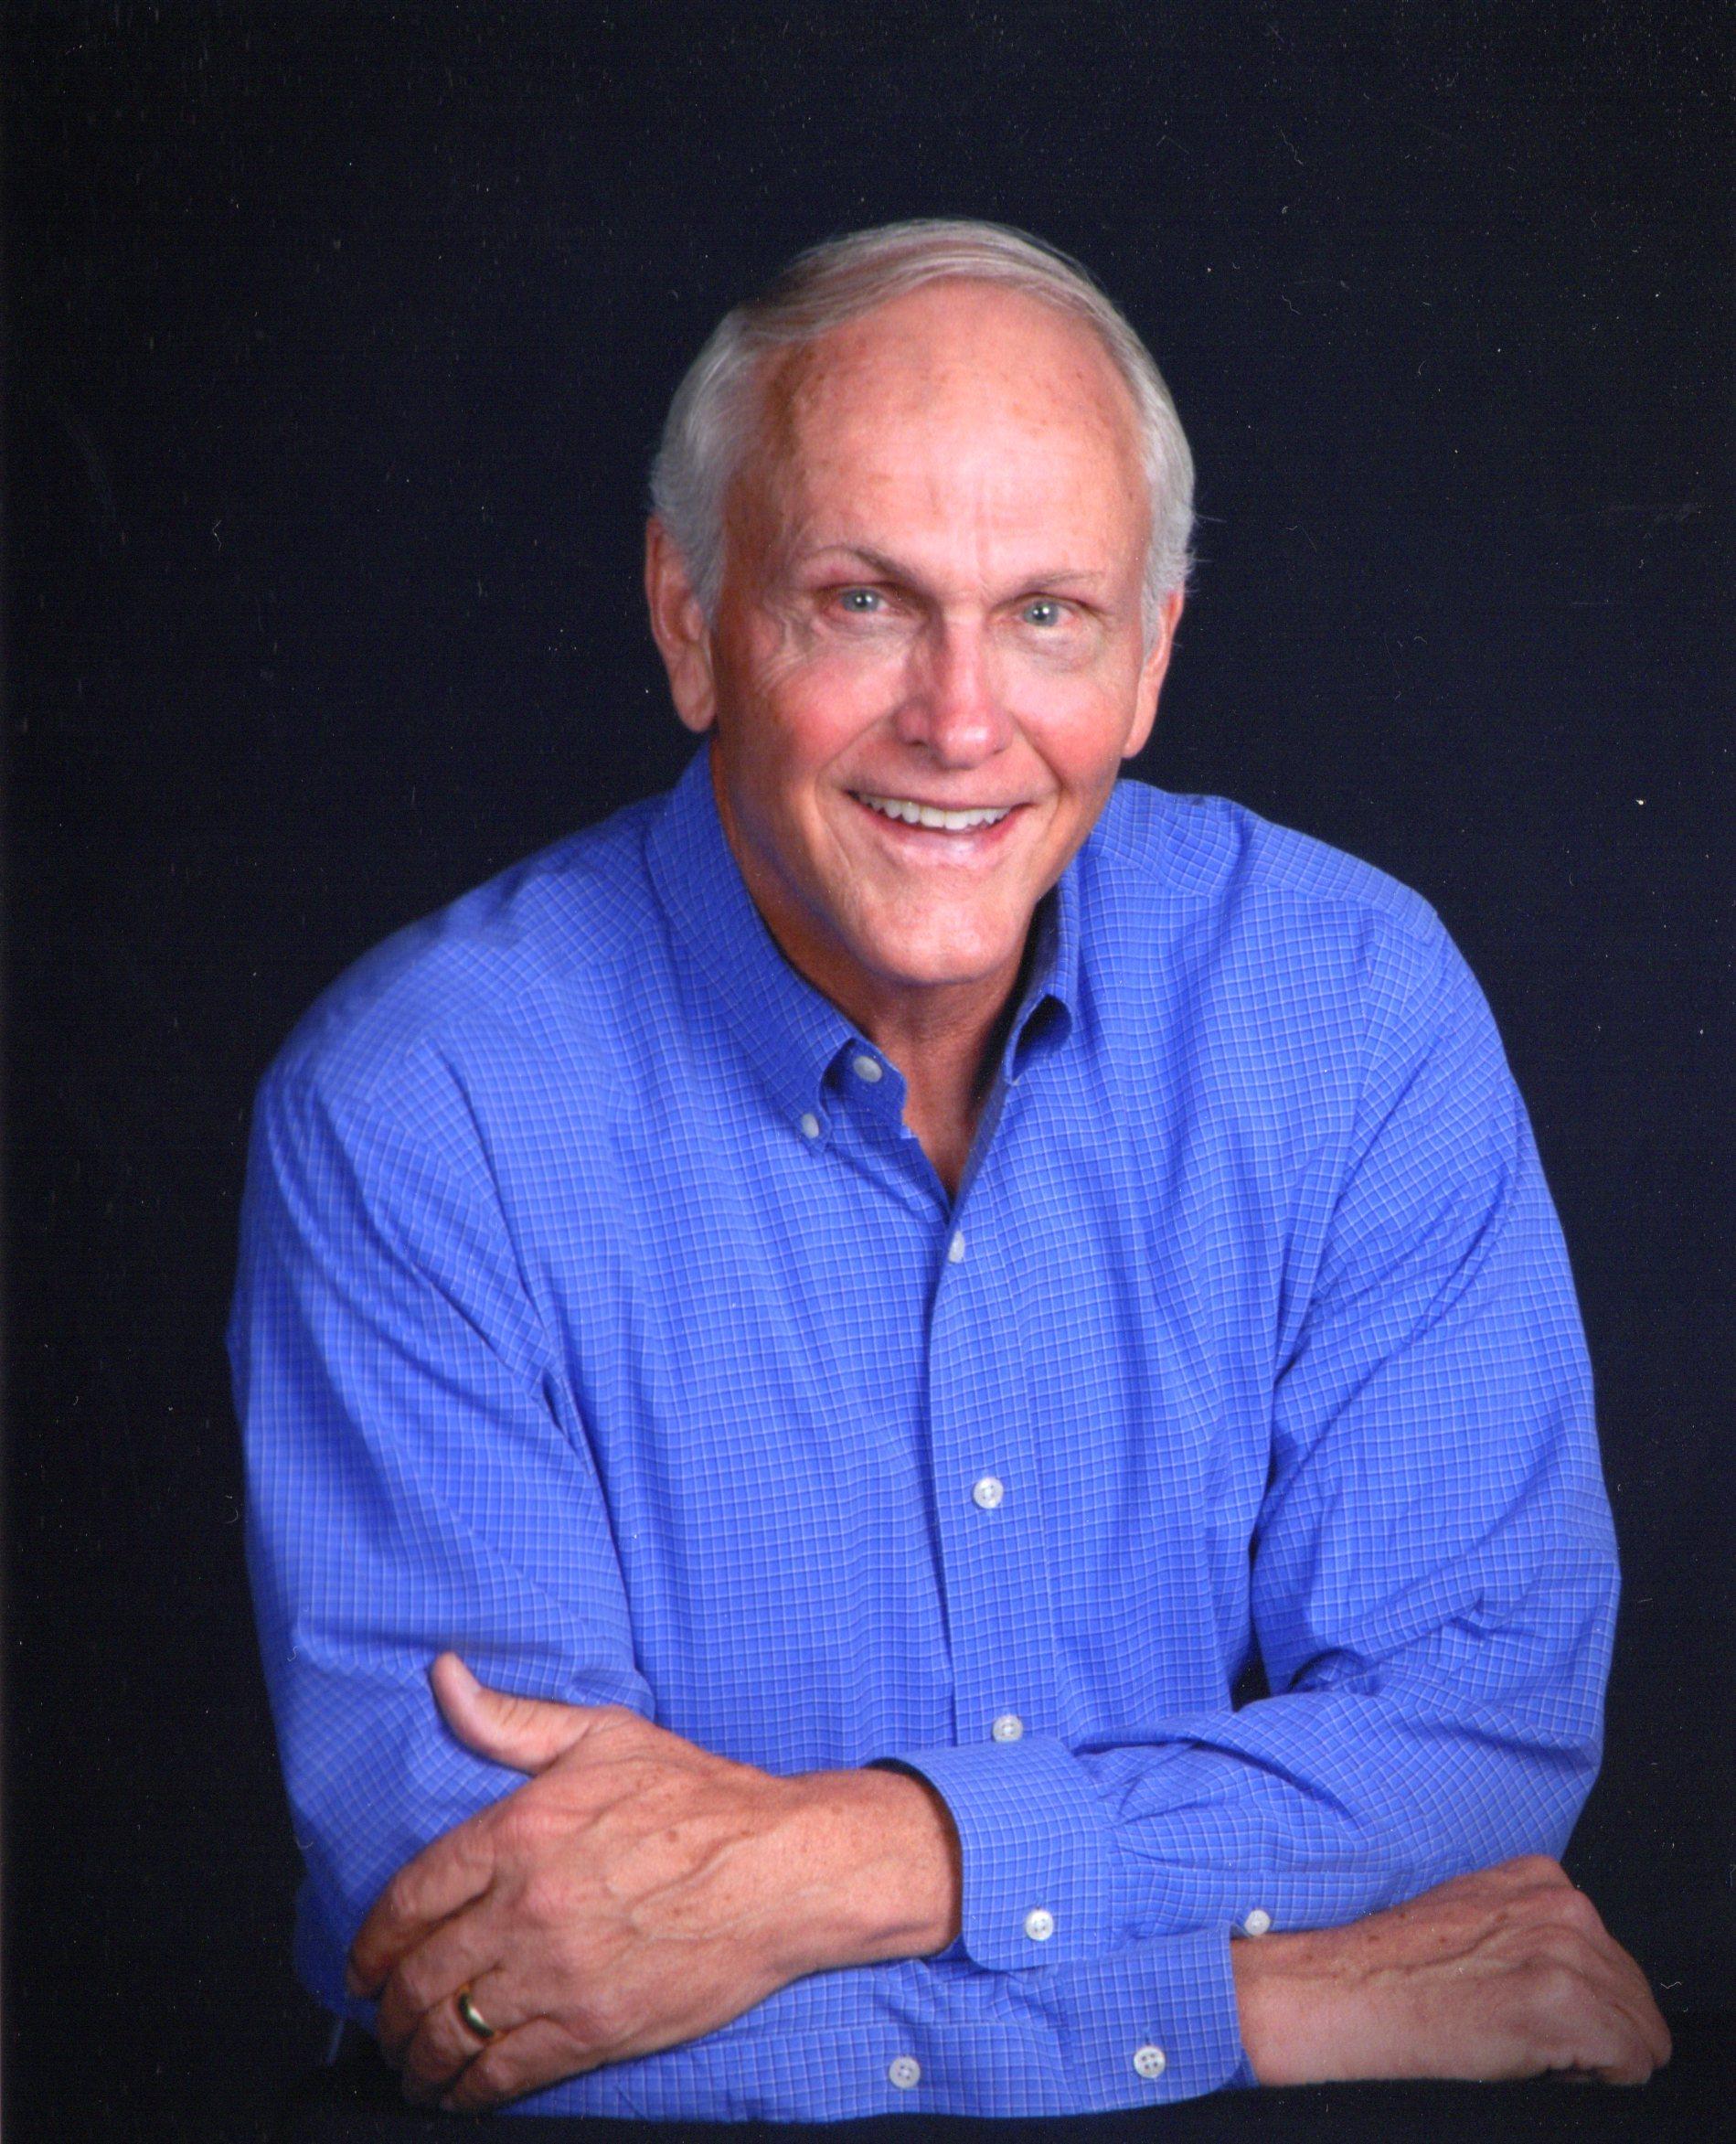 Larry Radney Photo.JPG.jpg